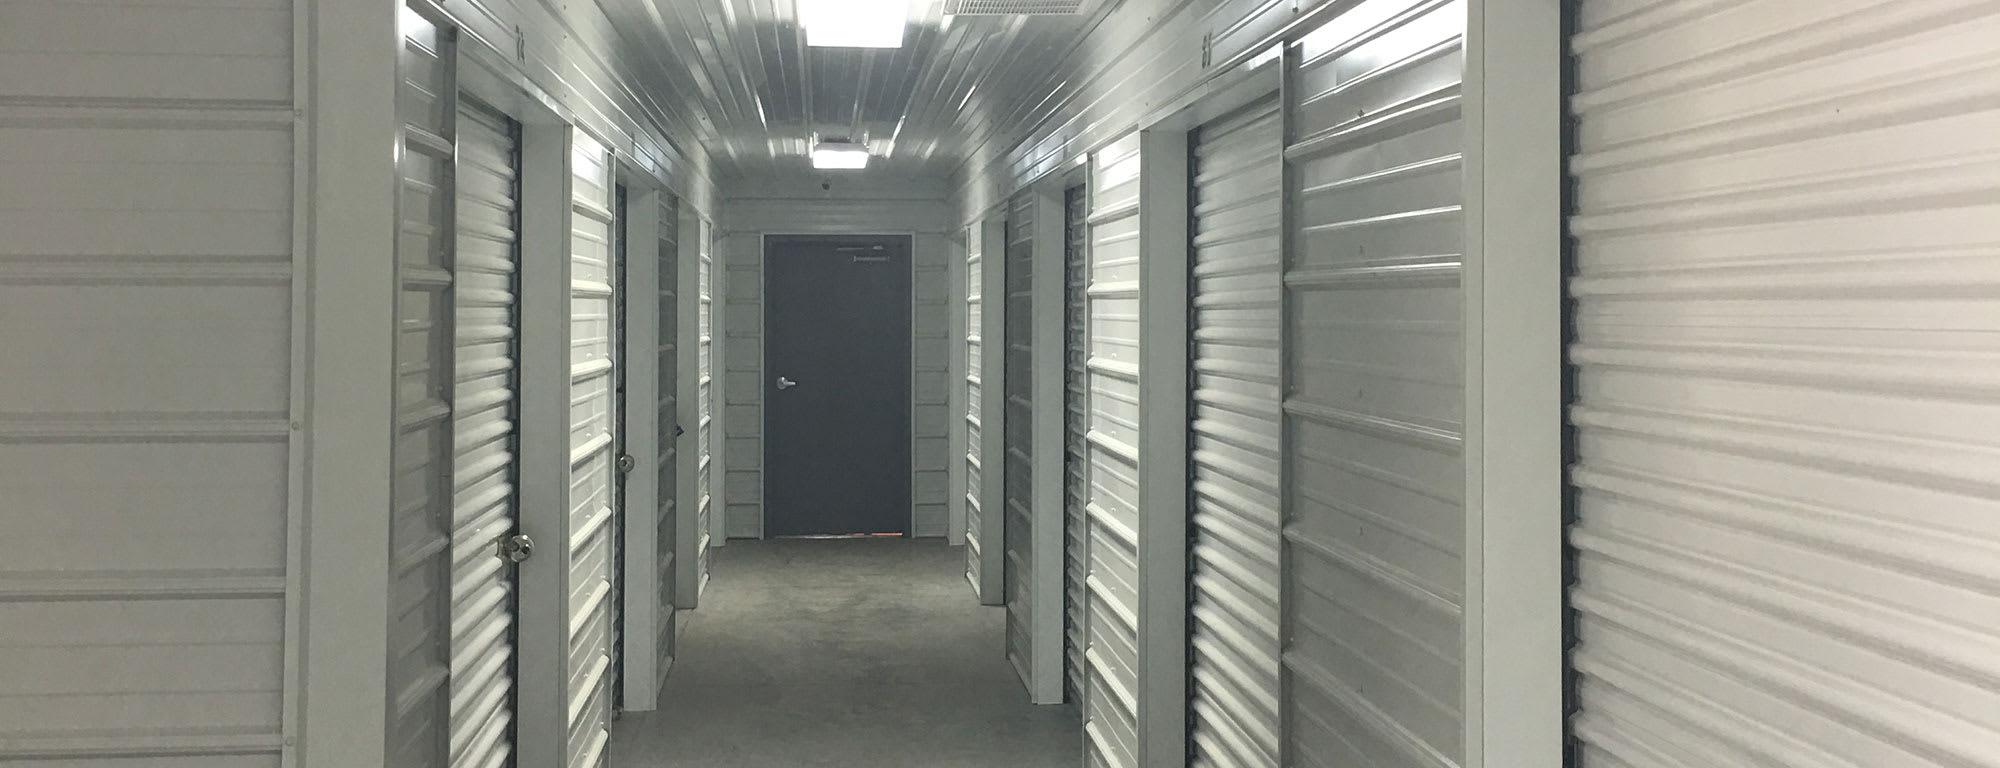 Self storage in Crane, Missouri